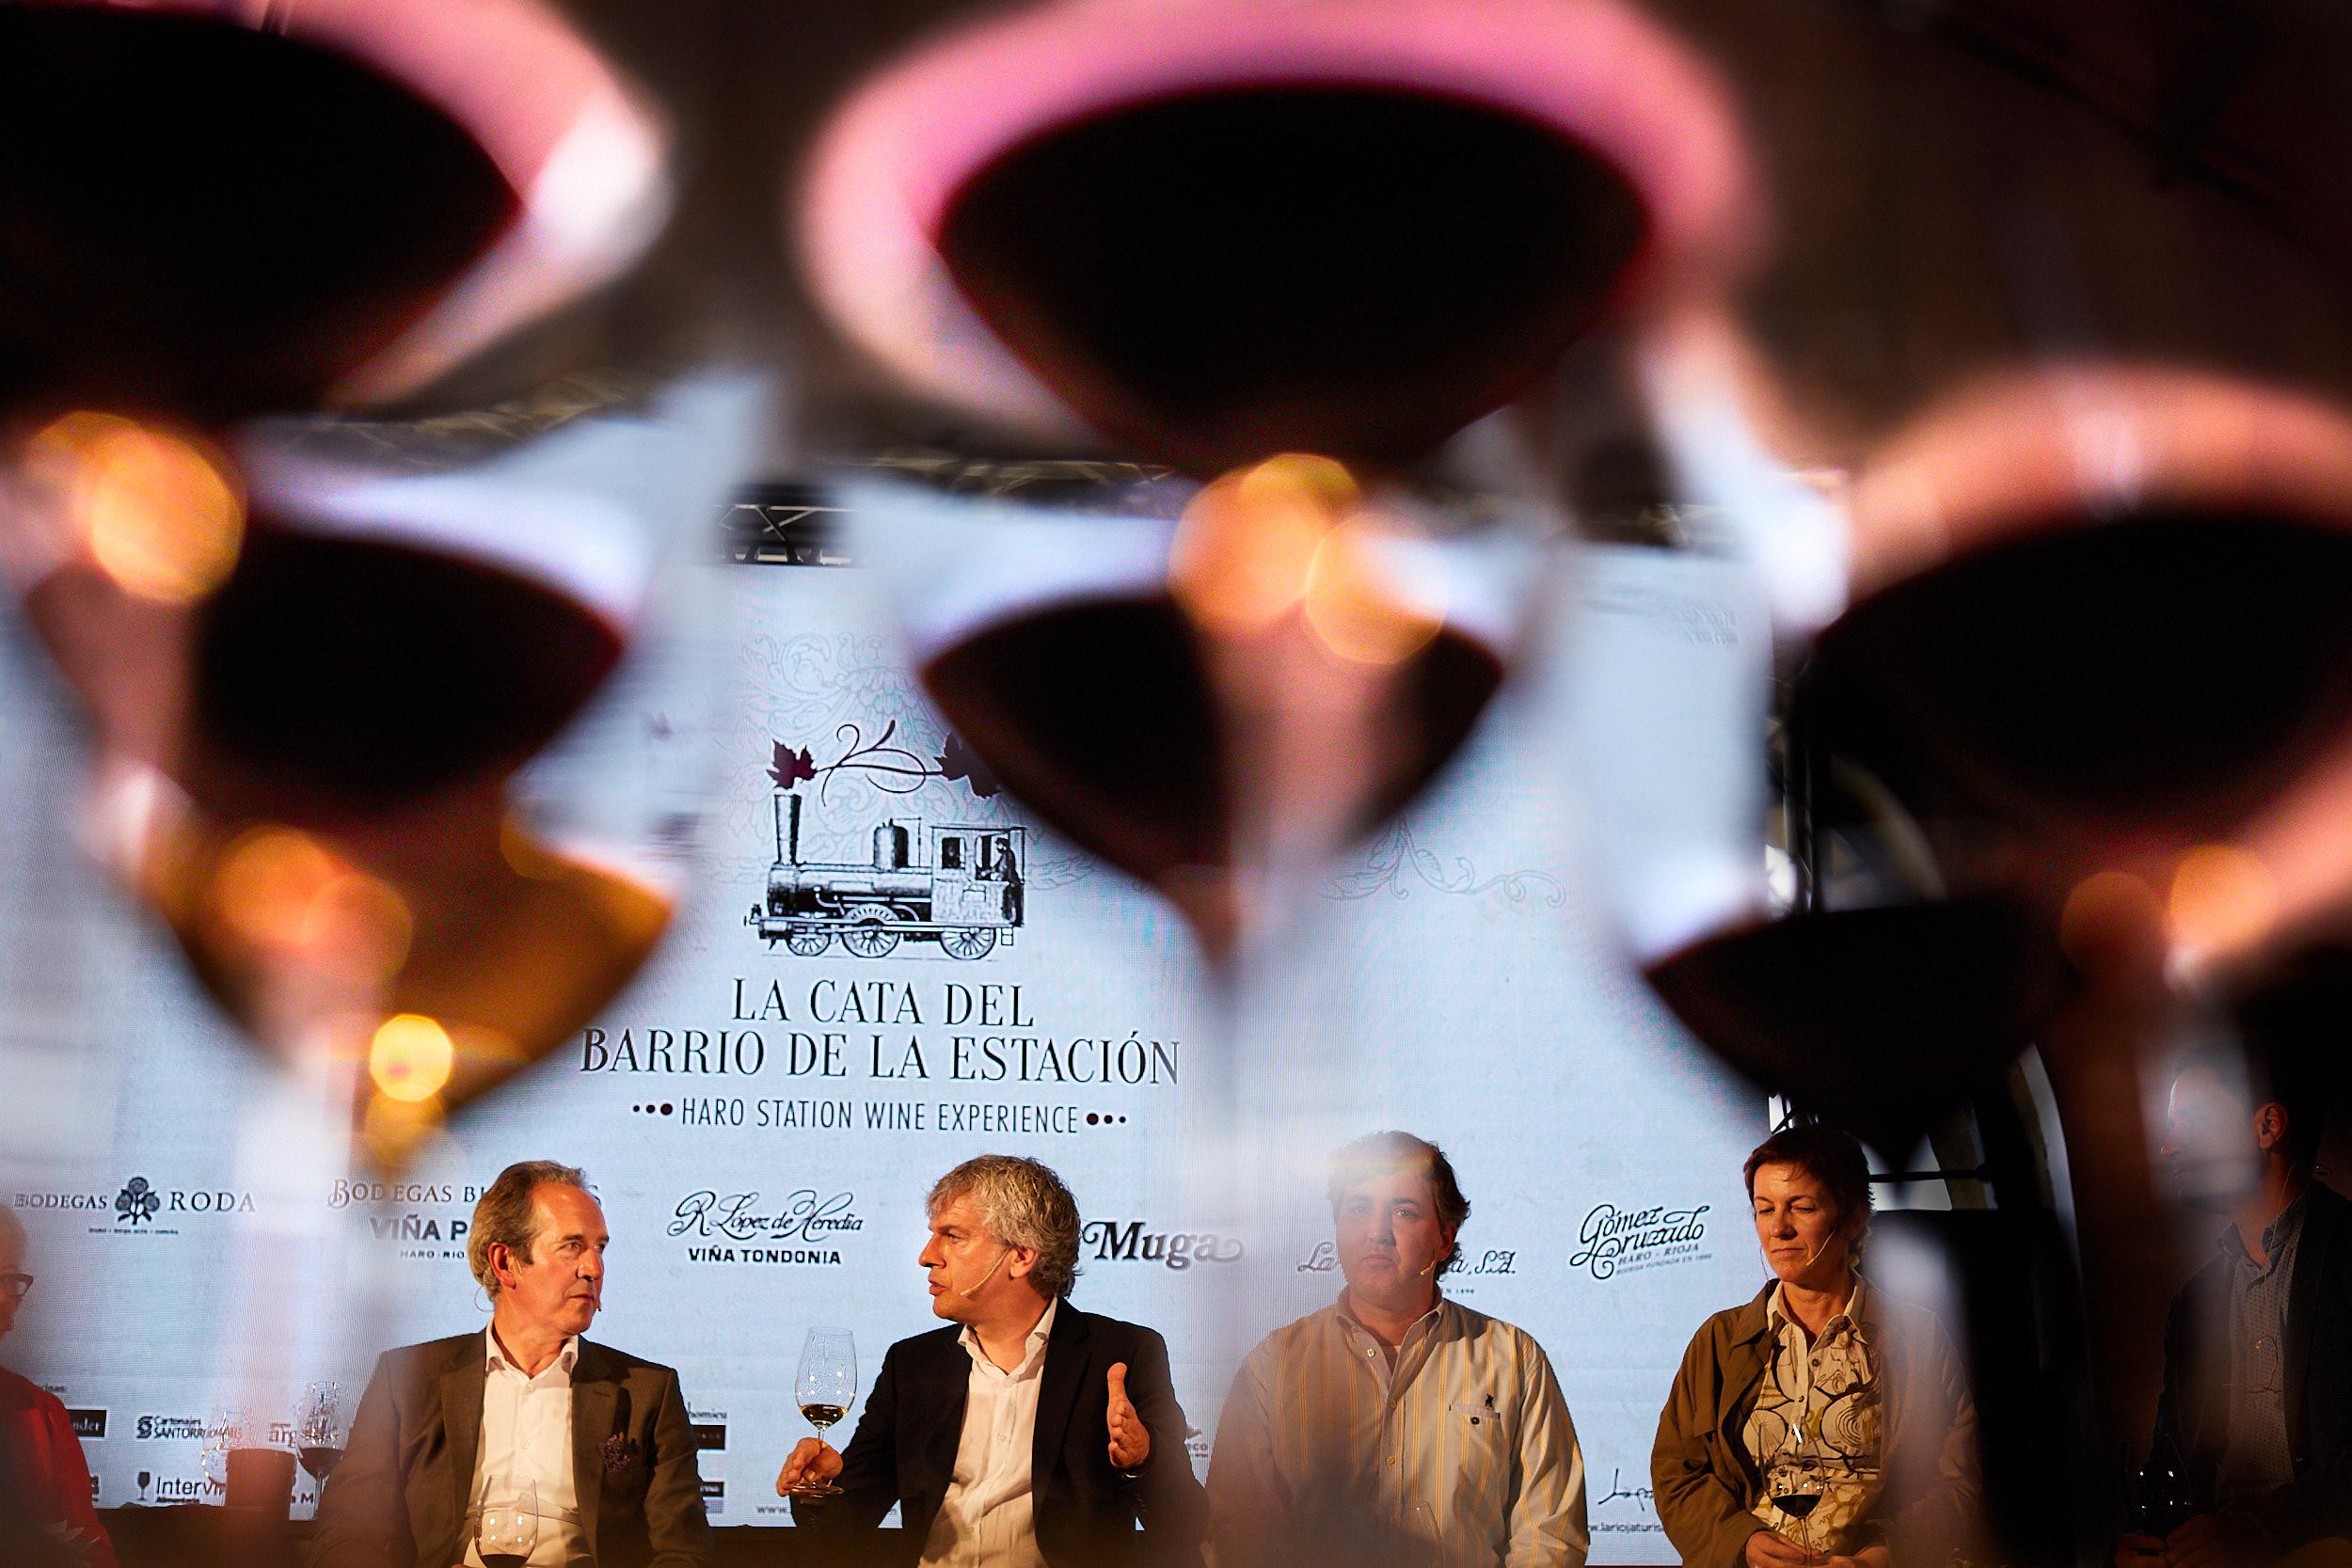 18/6/18 Event photographer Rioja Spain. Cata del Barrio de la Estacion, Haro, La Rioja, Spain. Photo by James Sturcke | sturcke.org